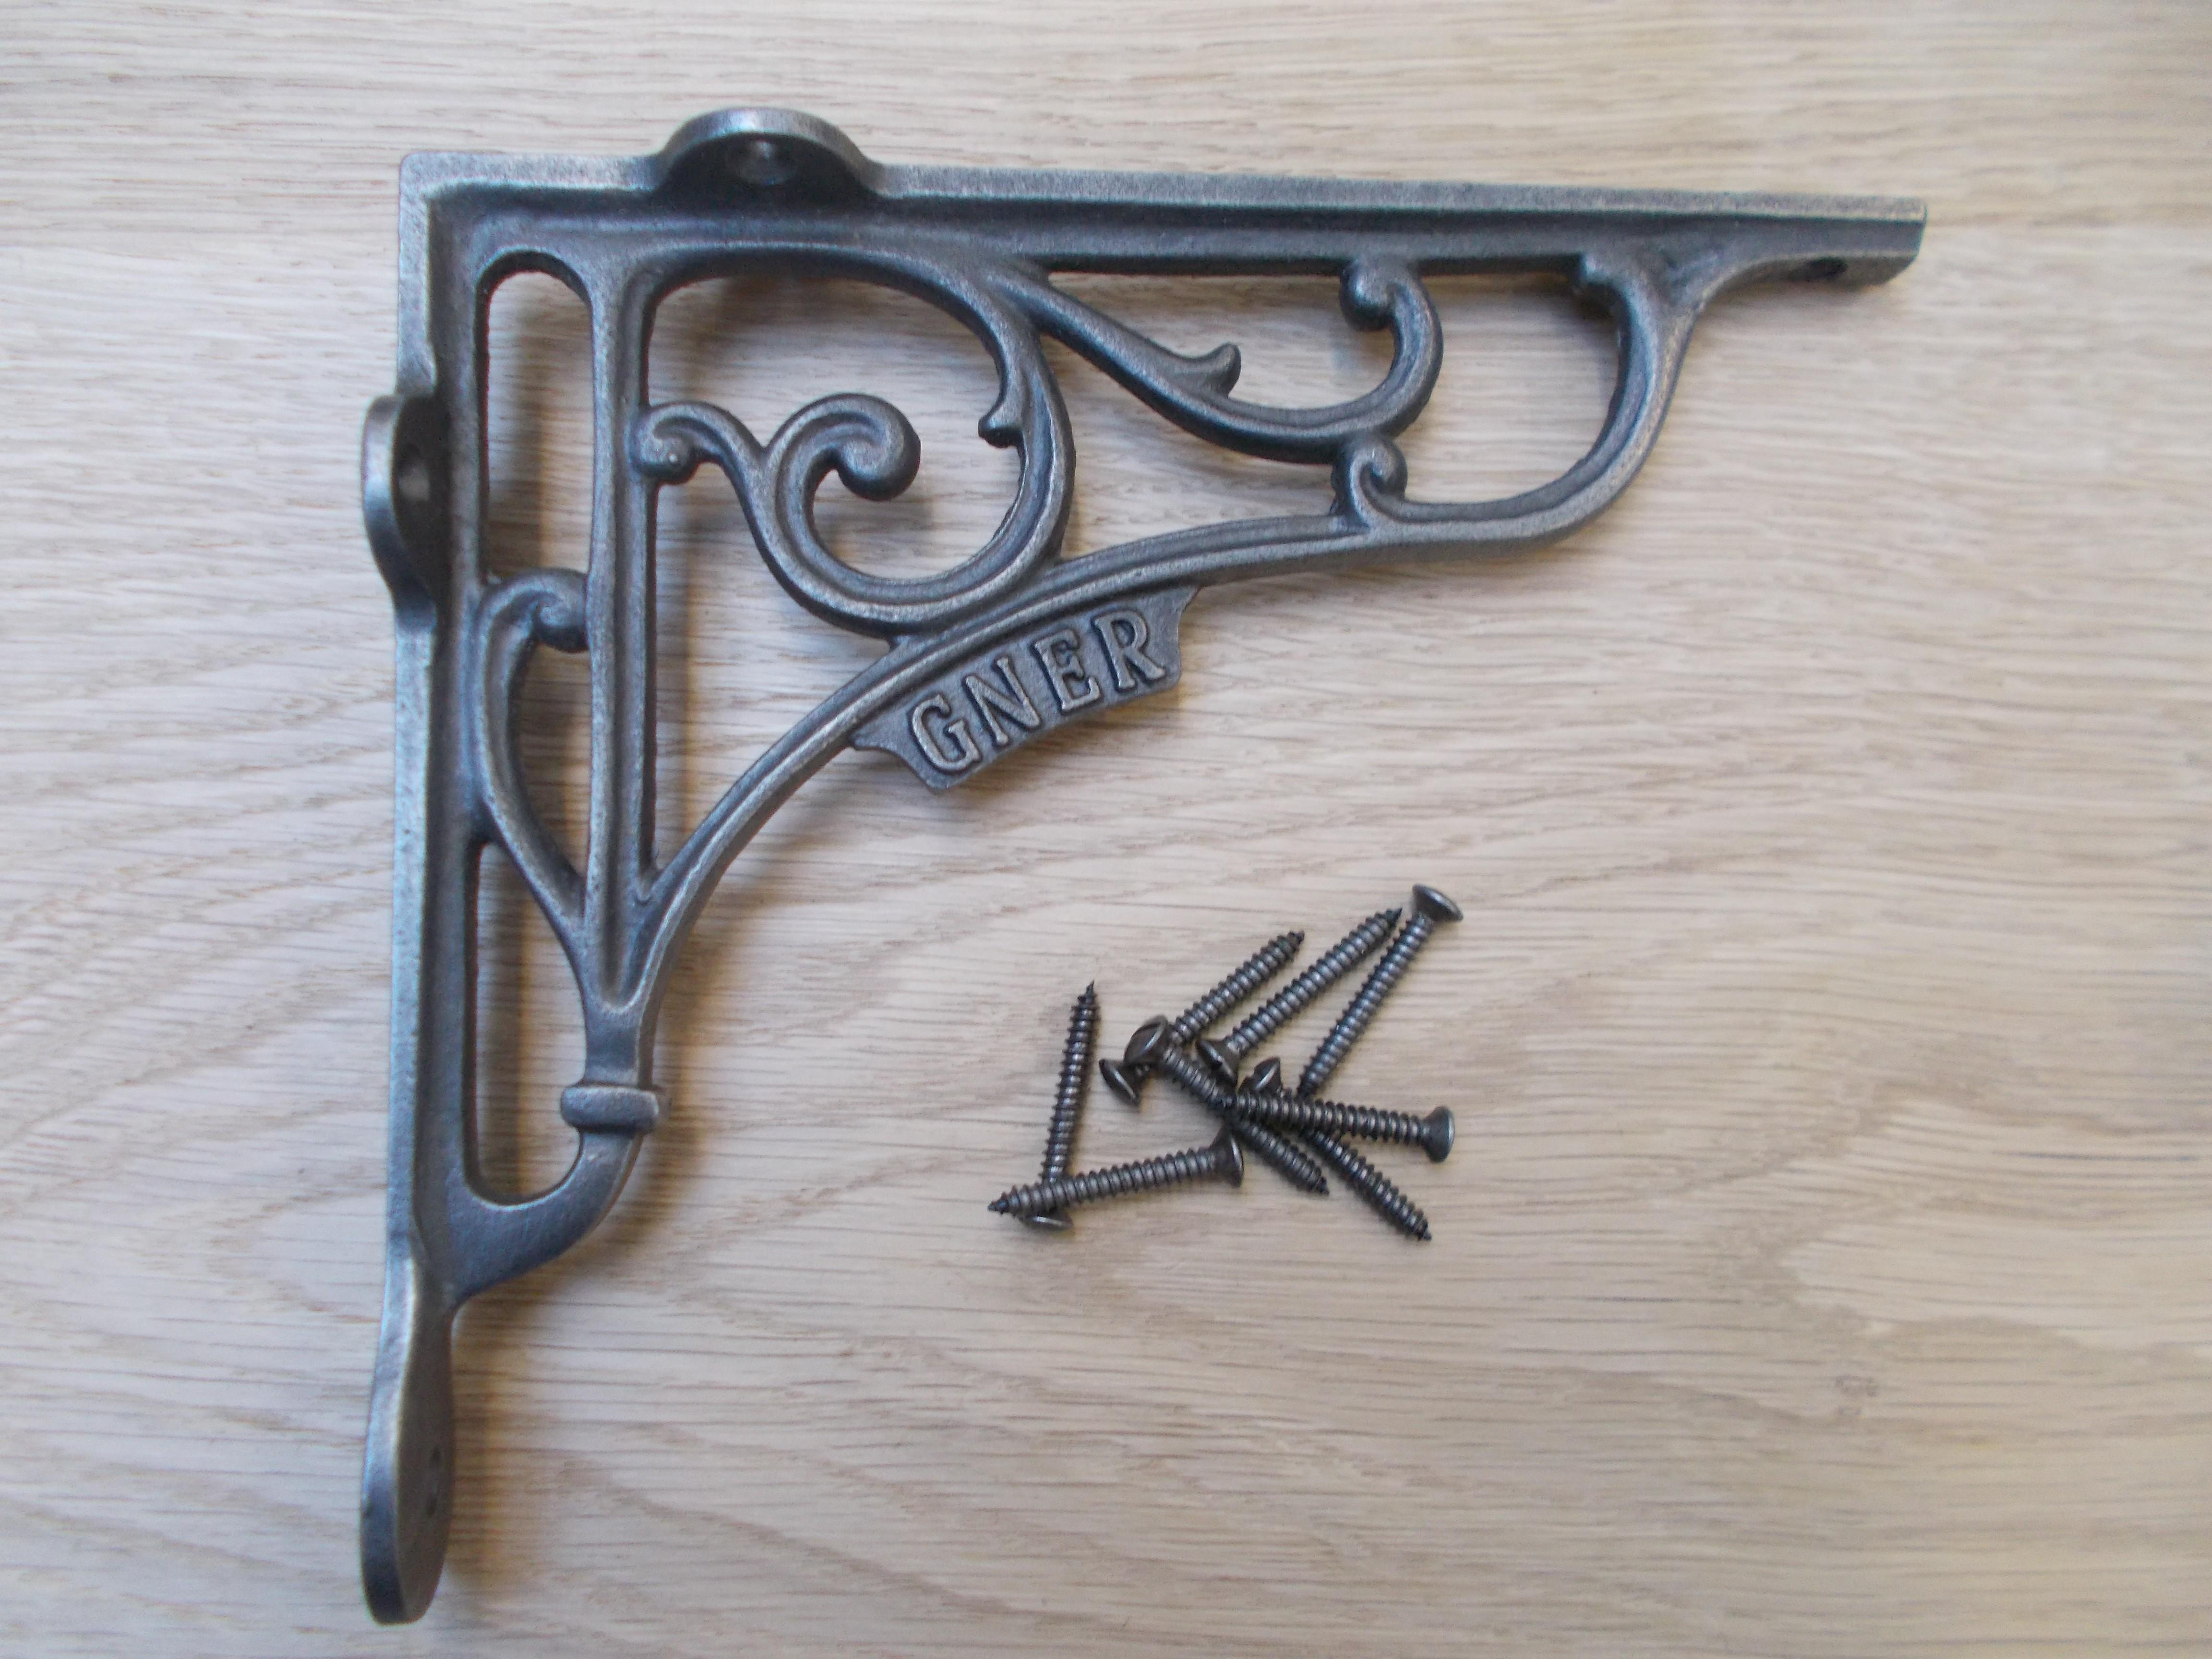 1 X Gner Railway Antique Vintage Style Cast Iron Shelf